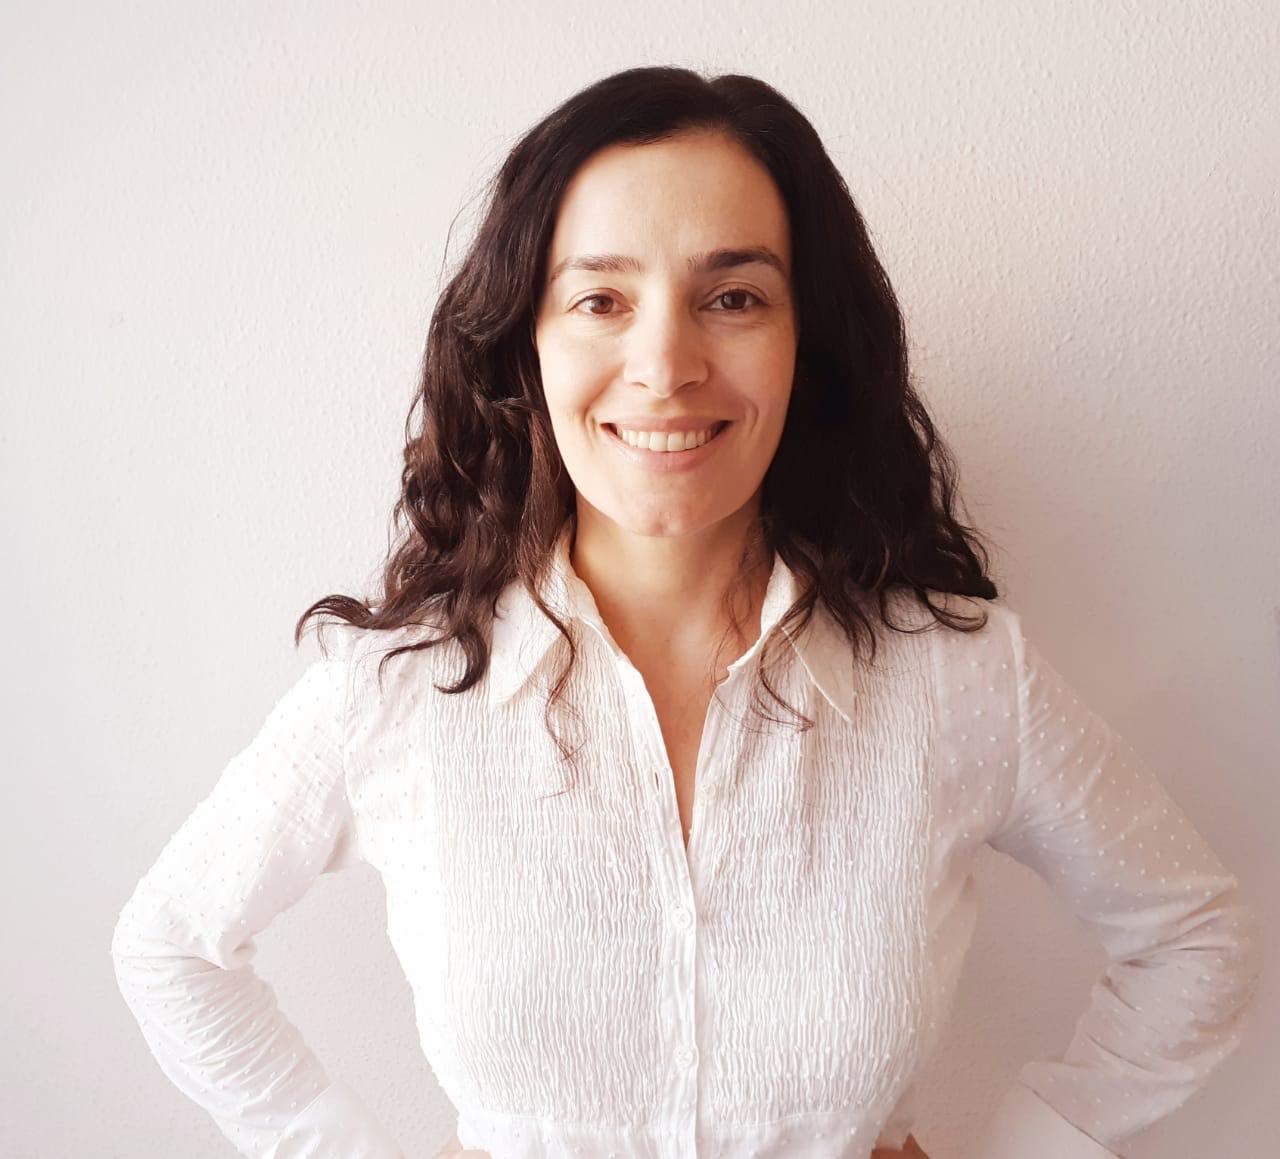 Paula Toletino Cales